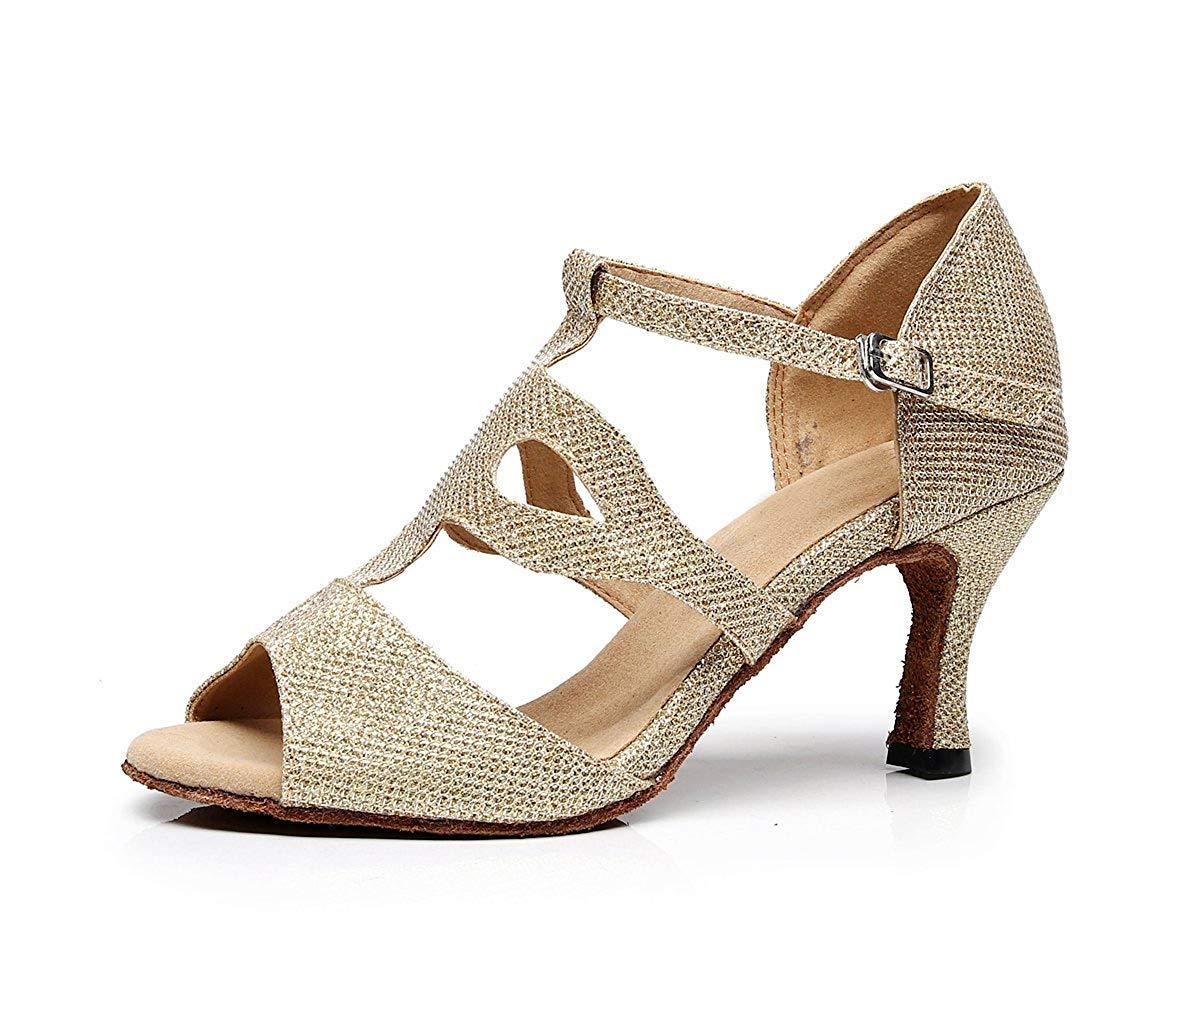 Fuxitoggo TJ7135 Damen Mädchen T-Strap Glitter Salsa Latin Dancing Sandalen (Farbe   Gold-7.5cm Heel Größe   6 UK)